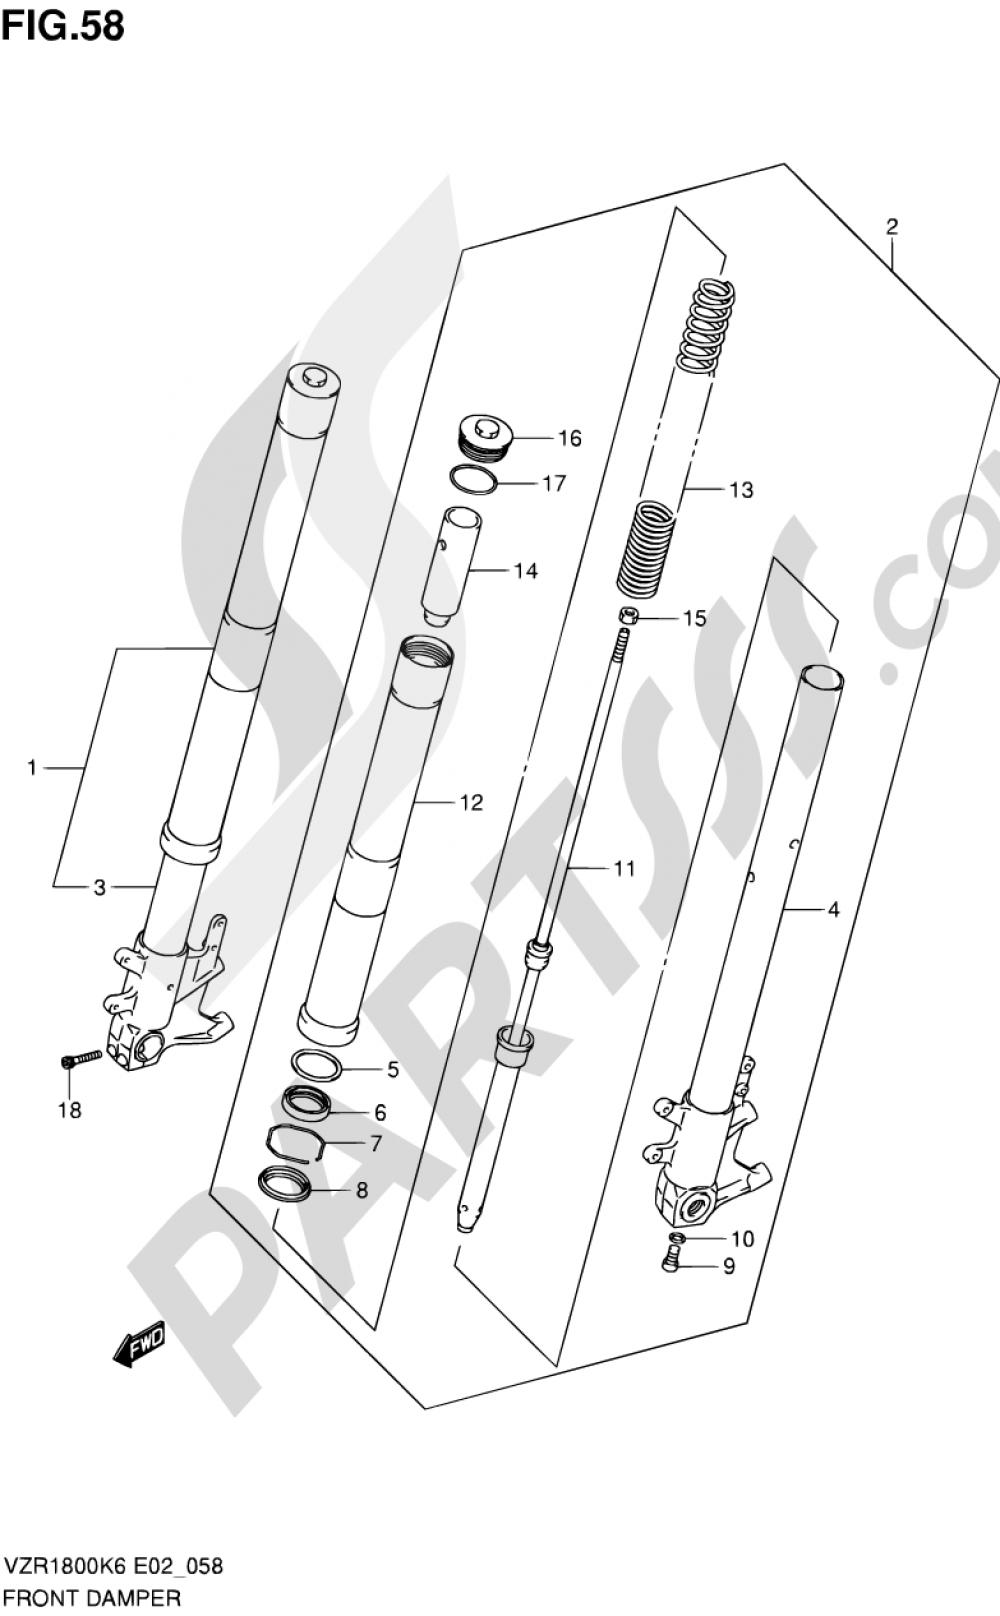 58 - FRONT DAMPER (VZR1800K6/U2K6/K7/U2K7/NK8/NU2K8) Suzuki VZR1800N 2008